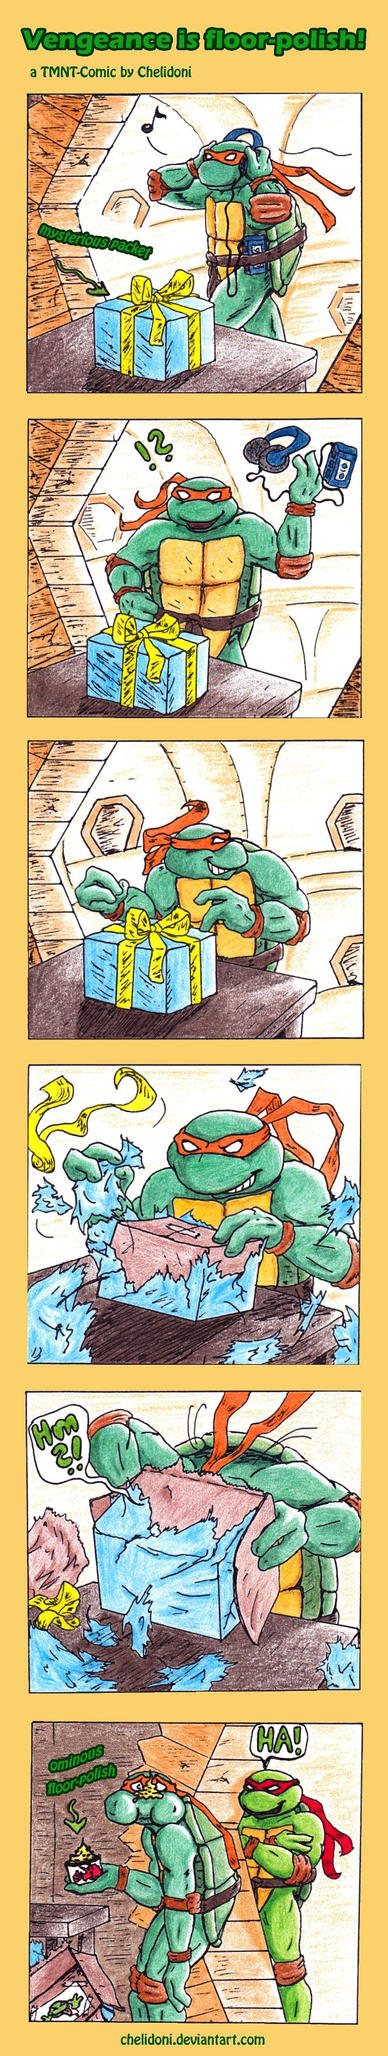 TMNT-comic: Vengeance is floor-polish! by Chelidoni